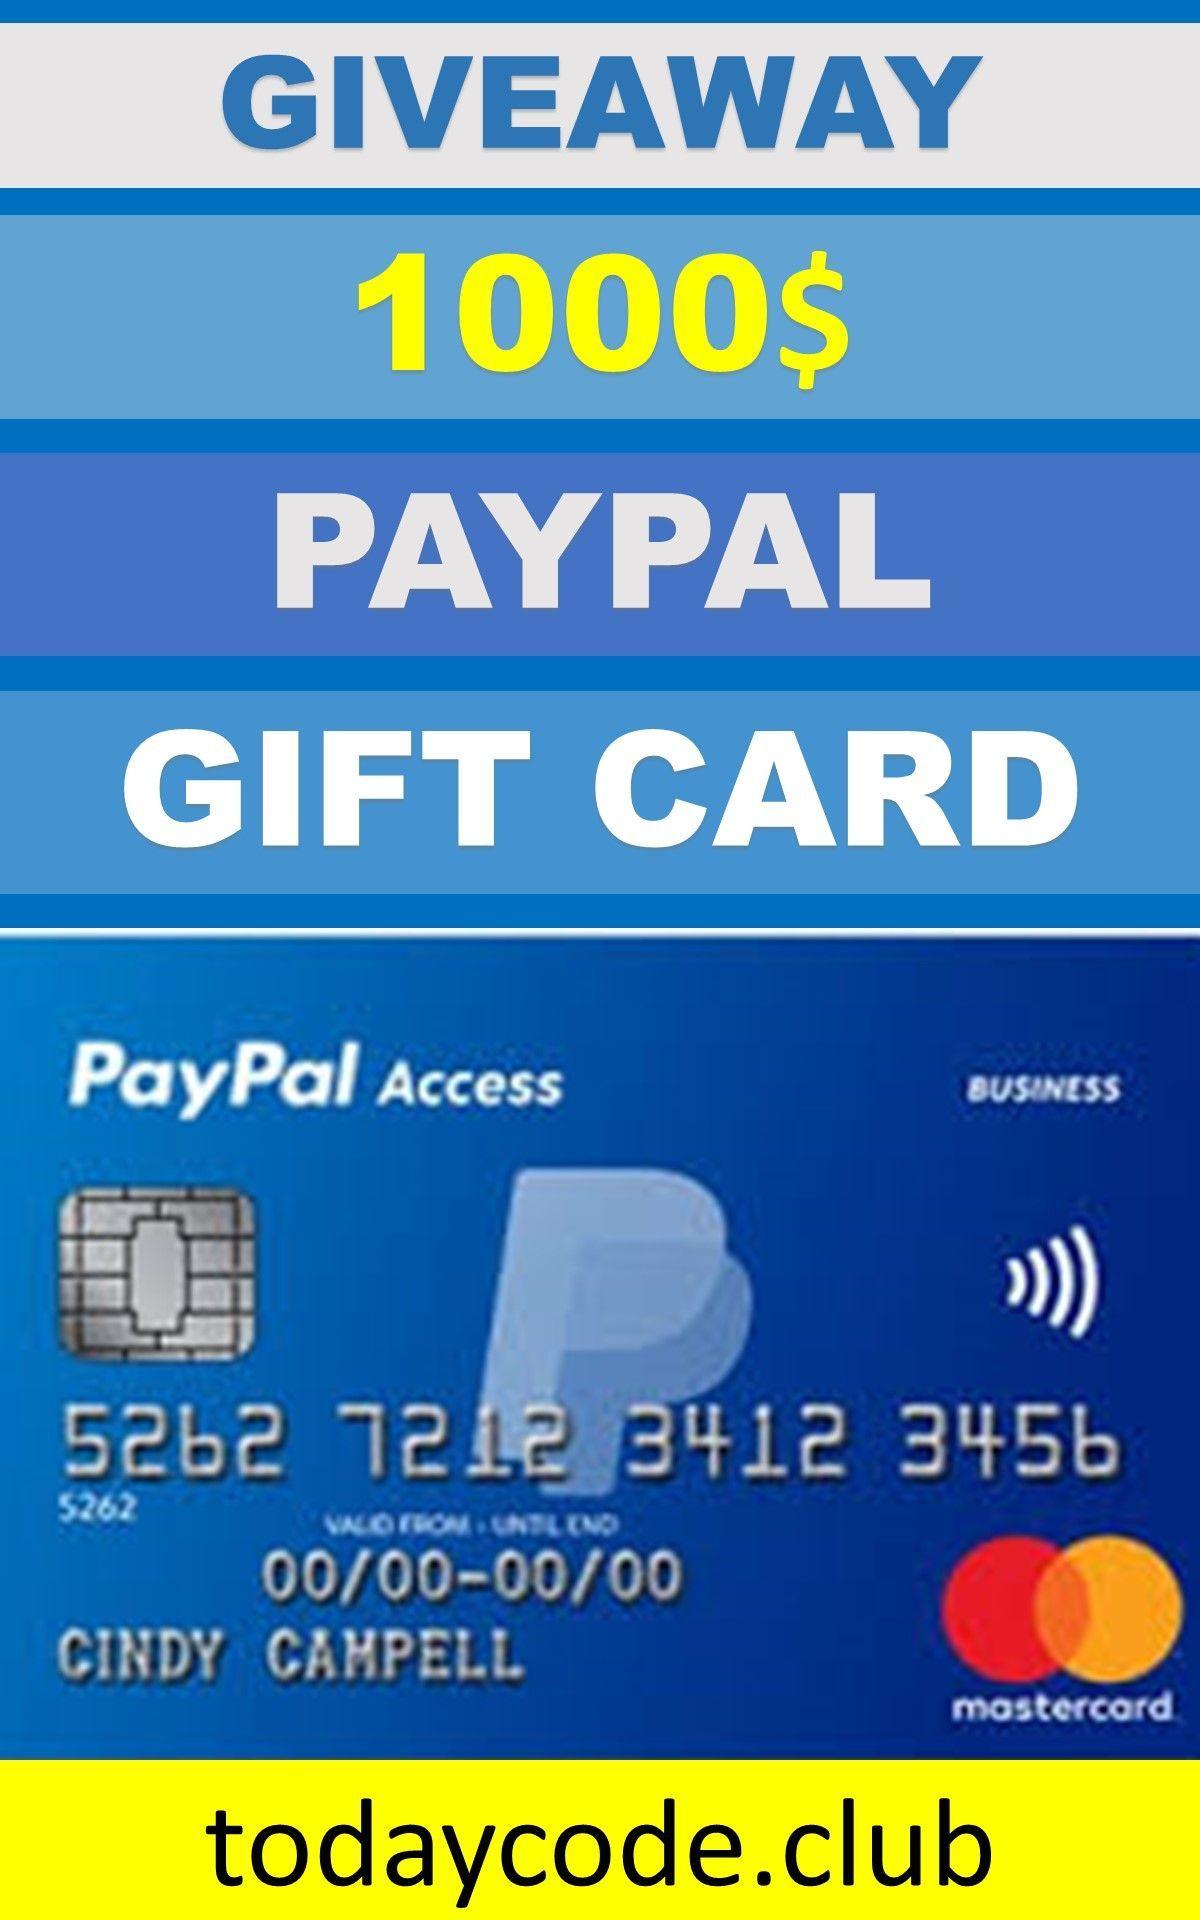 List Of Unused Amazon Gift Card Codes 2020 100 Working Cash Gift Card Gift Card Number Amazon Gift Card Free